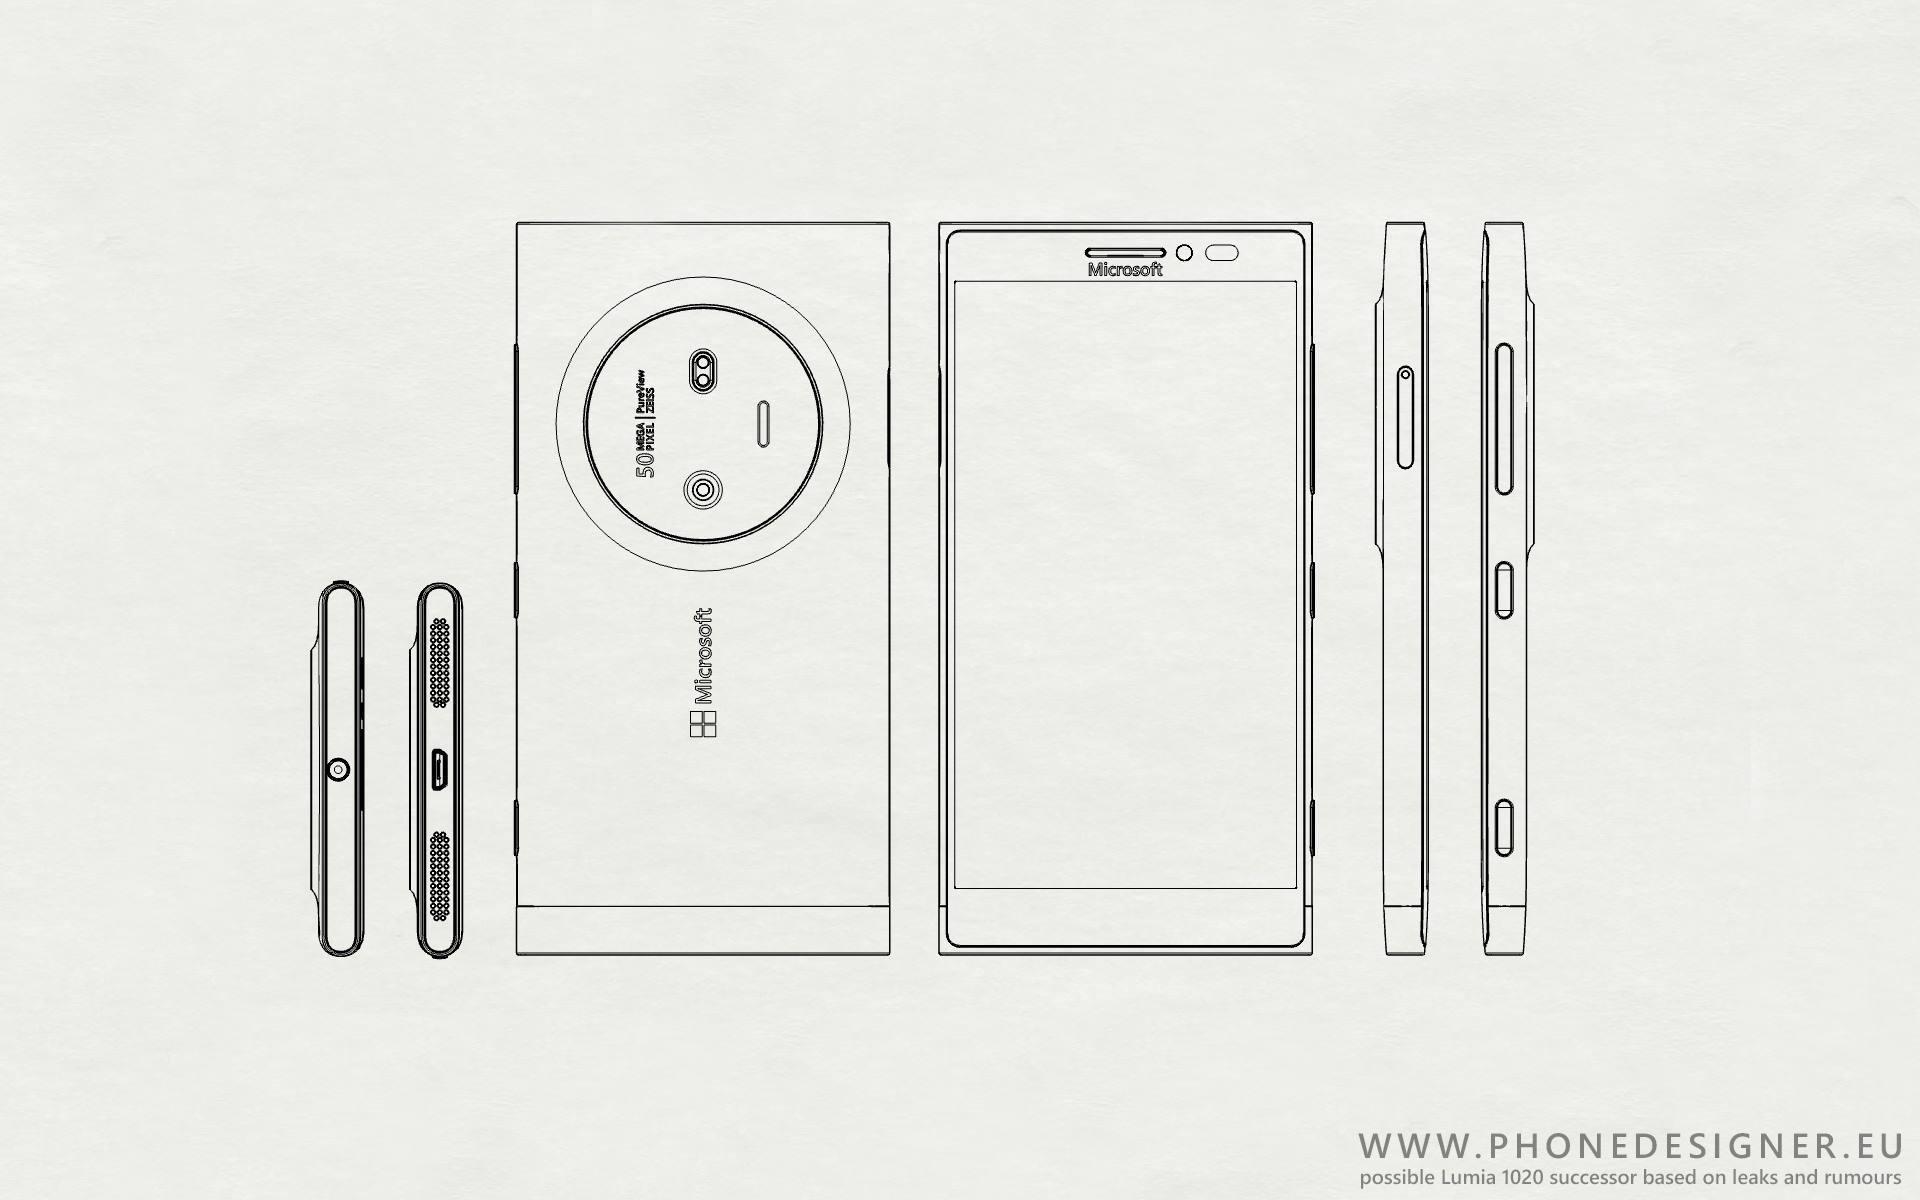 Microsoft Lumia 1030 - Prueba de concepto